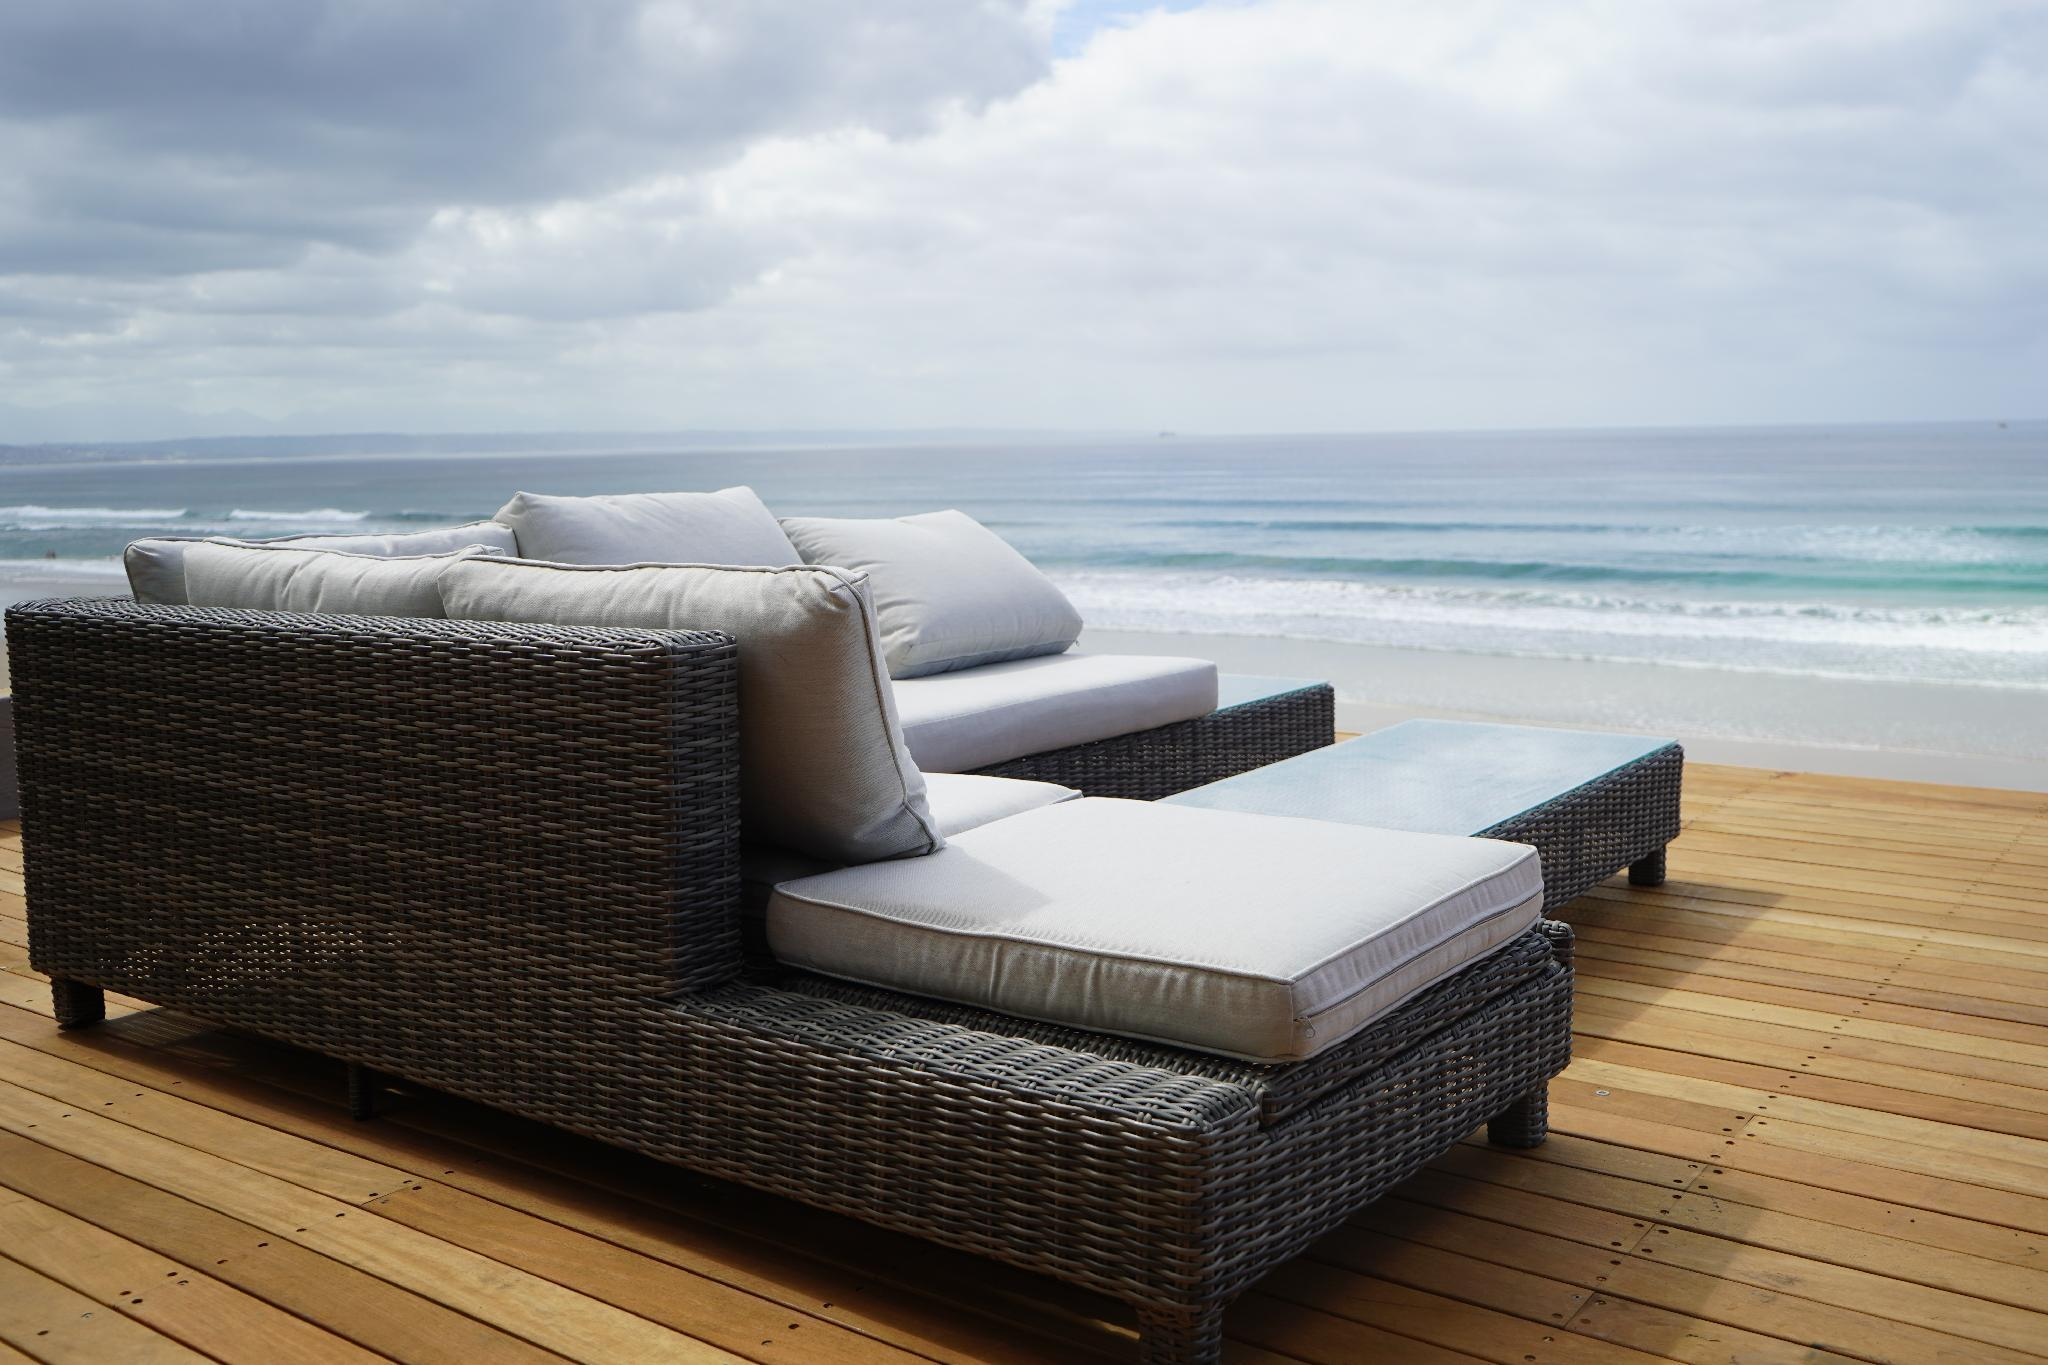 Bay Lodge On The Beach